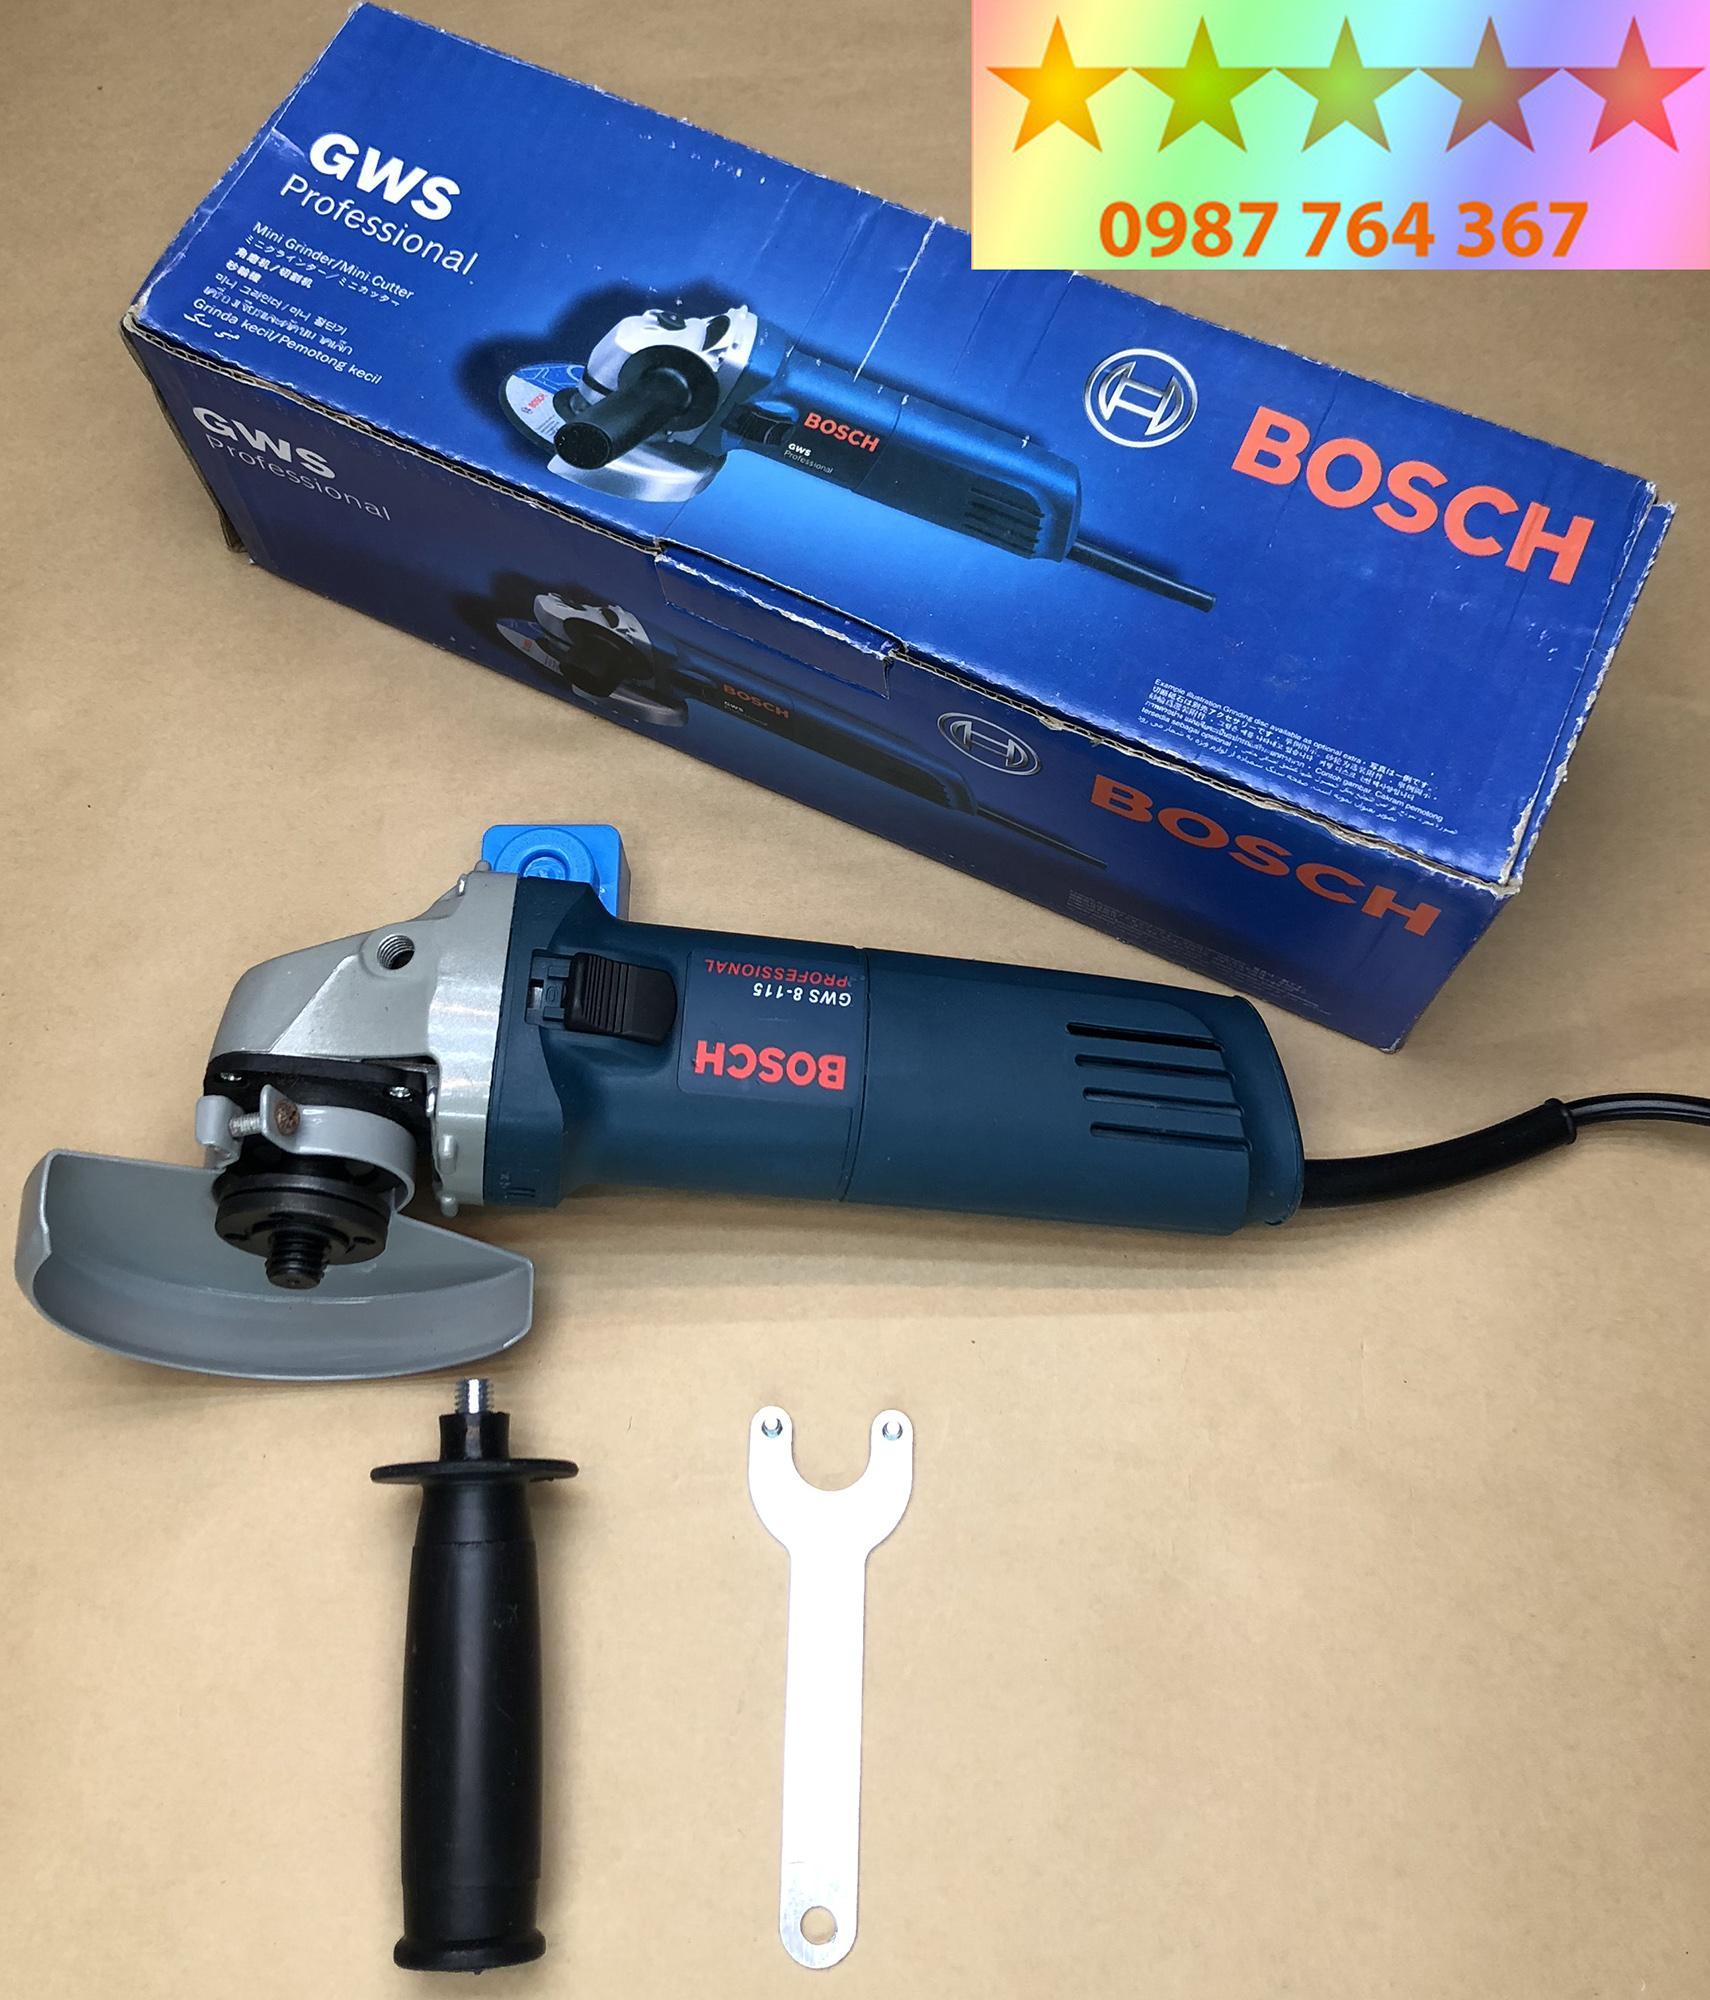 Máy cắt cầm tay Bosch 850W - Made in Malaysia - Tặng 2 lưỡi cắt kim loại + 2 chổi than